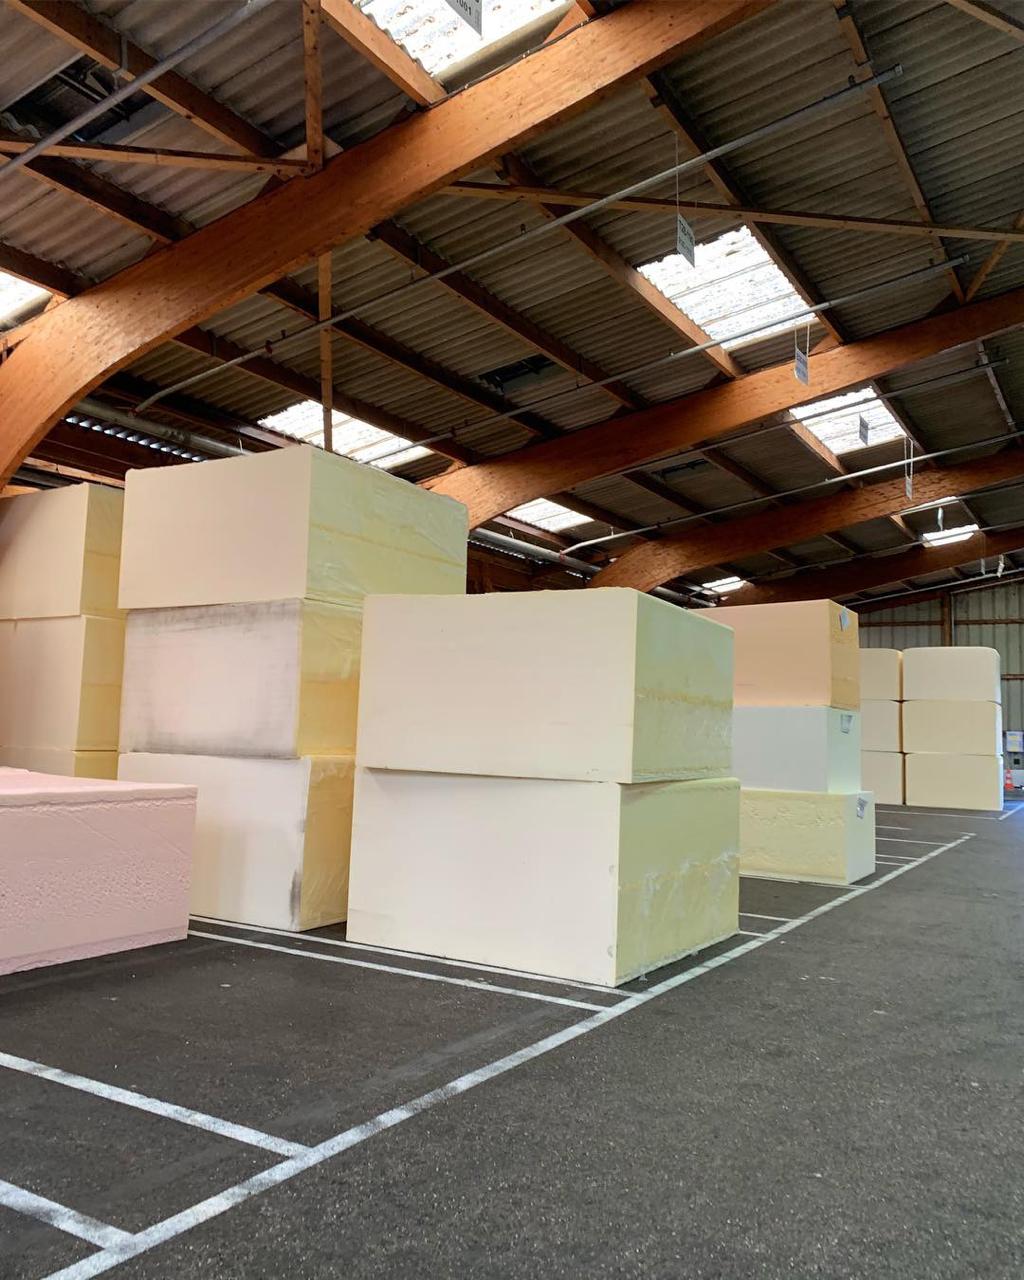 Large blocks of foam in 26 different densities await an order